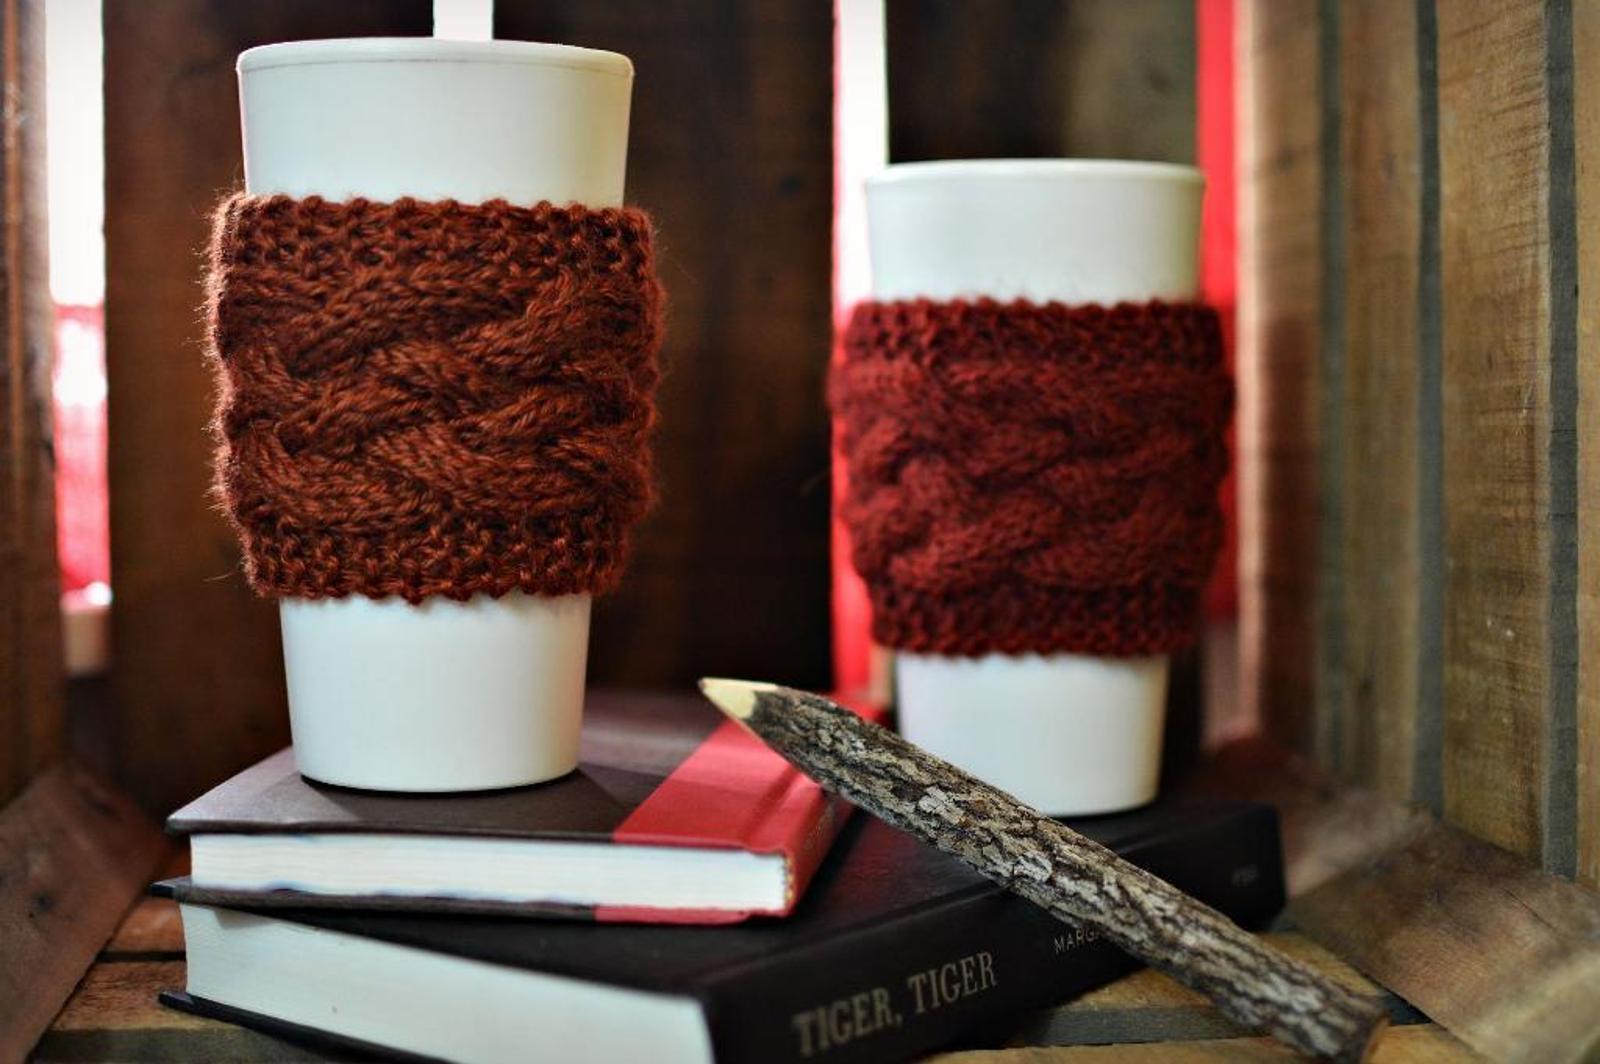 The Braid Seamless Coffee Cozy